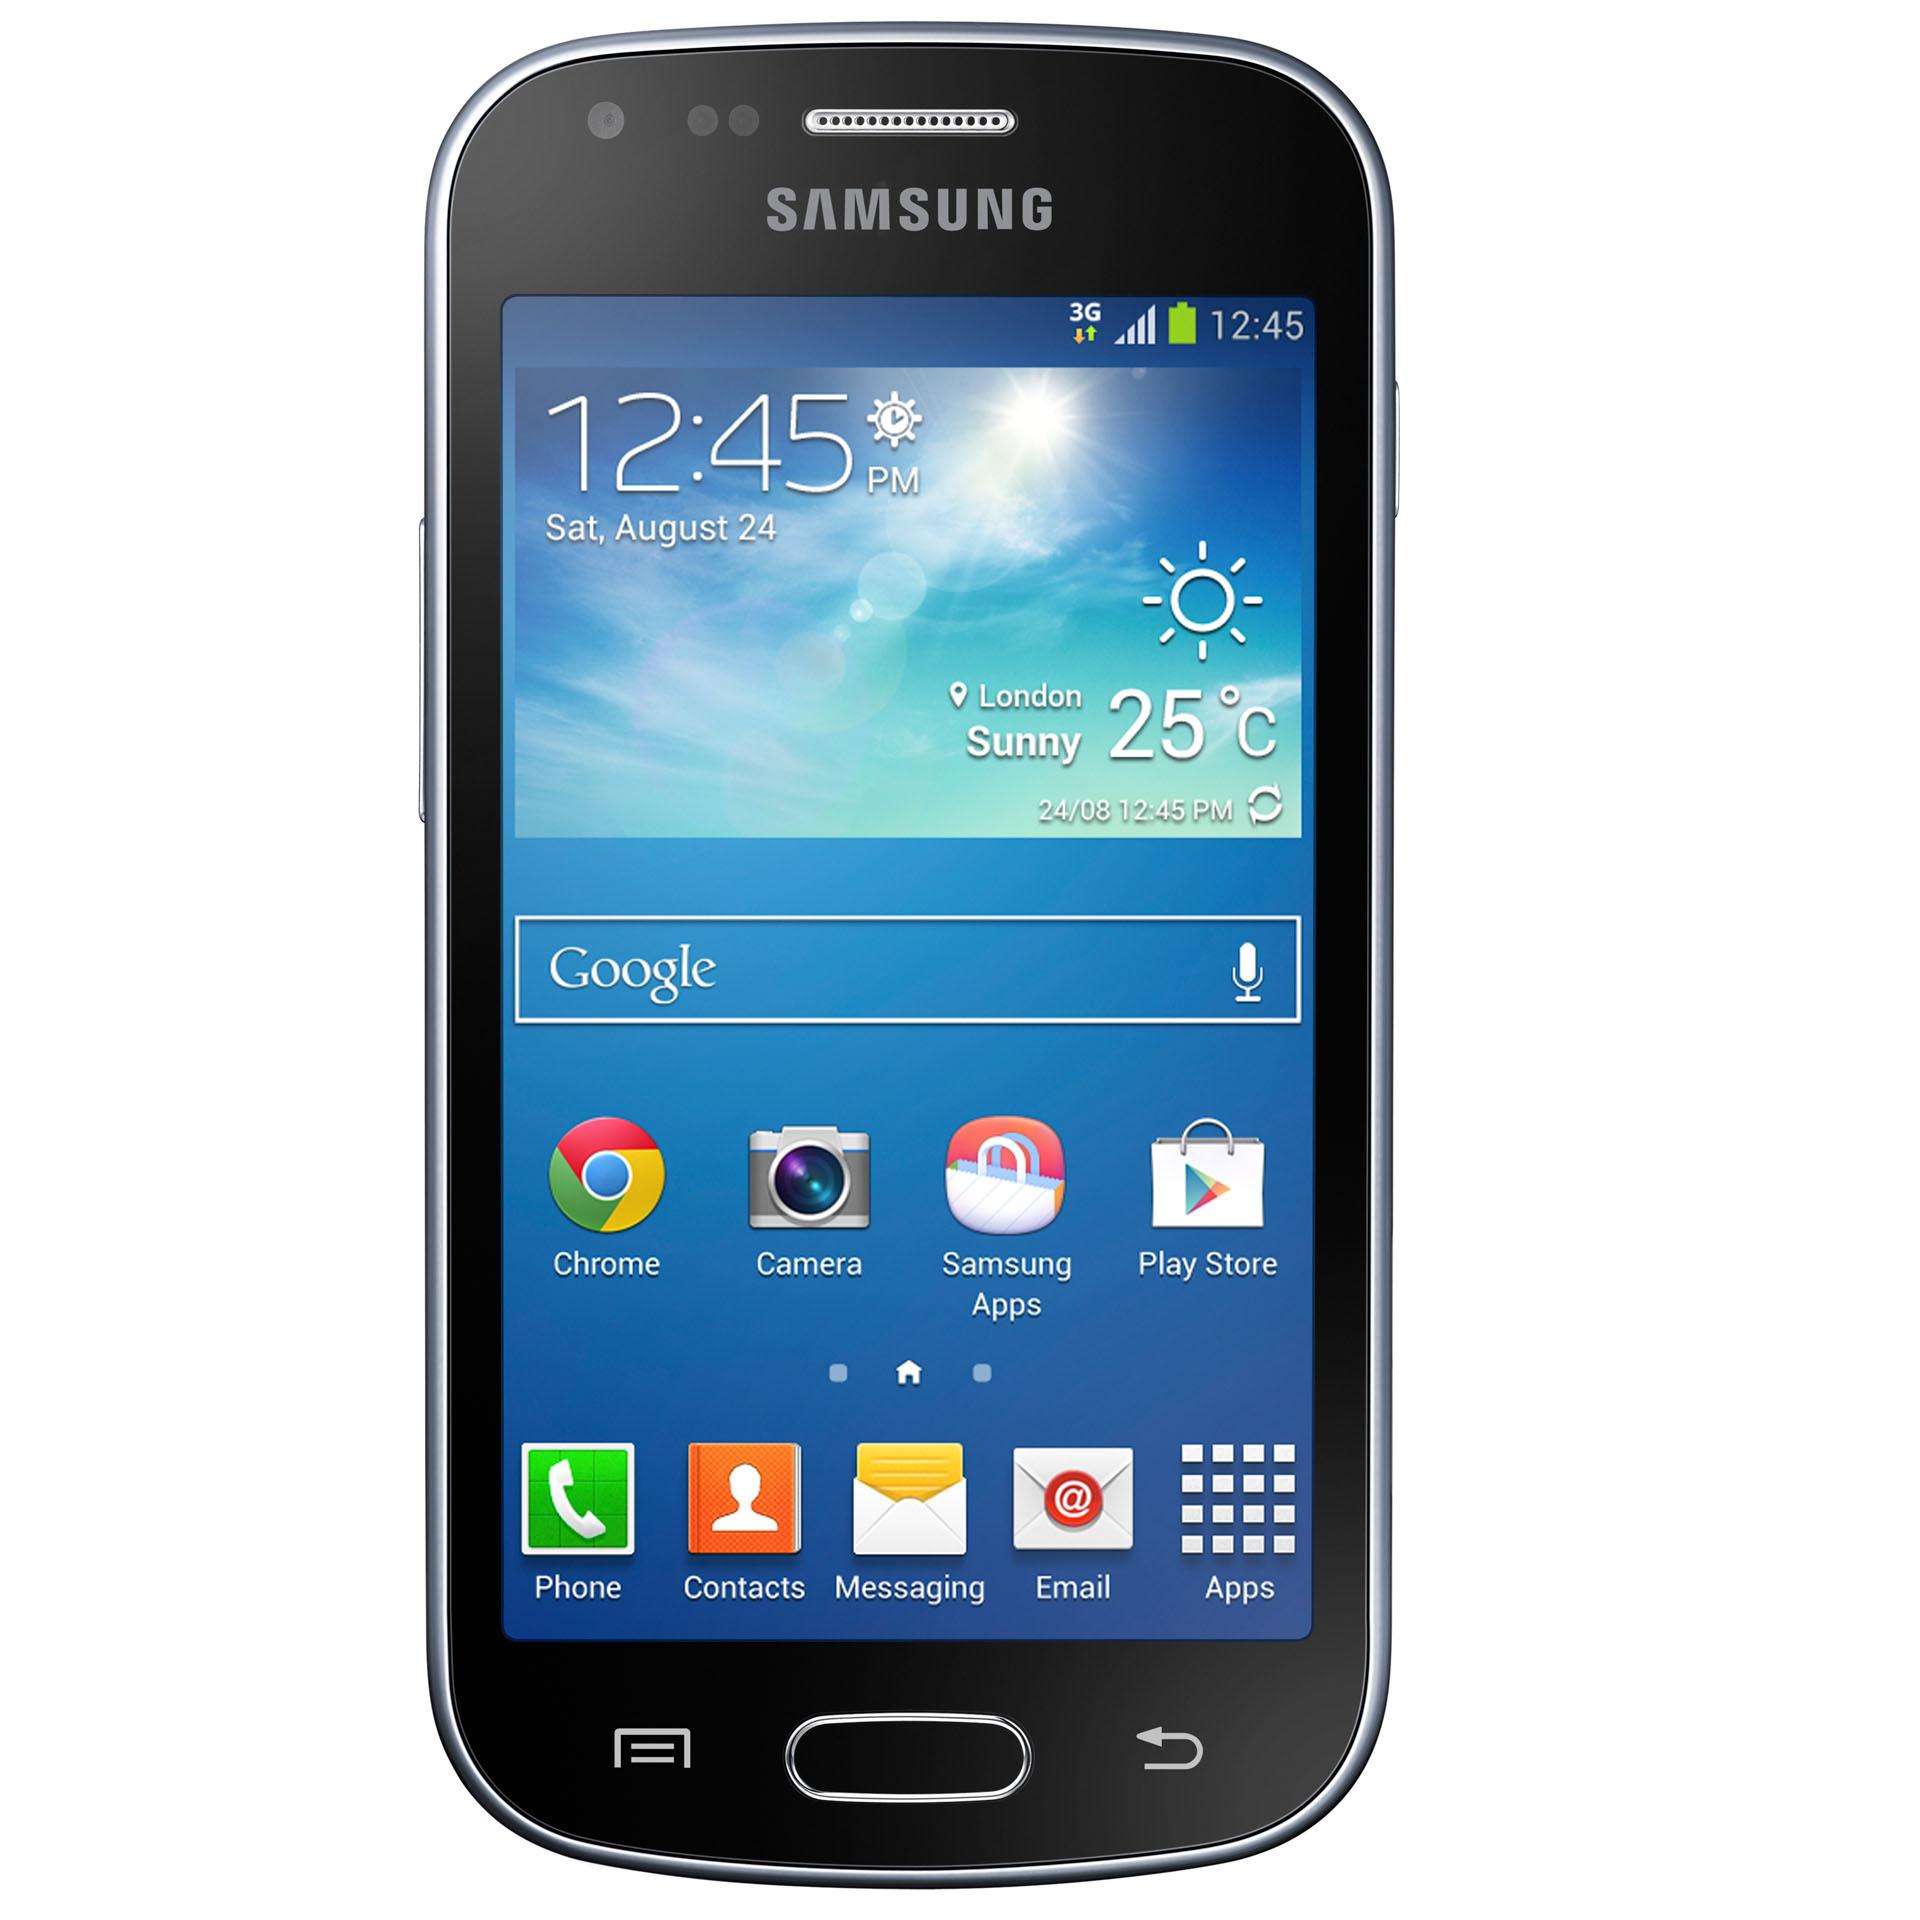 Gallery for gt samsung galaxy s6102 - Samsung Galaxy Trend Plus Gt S7580